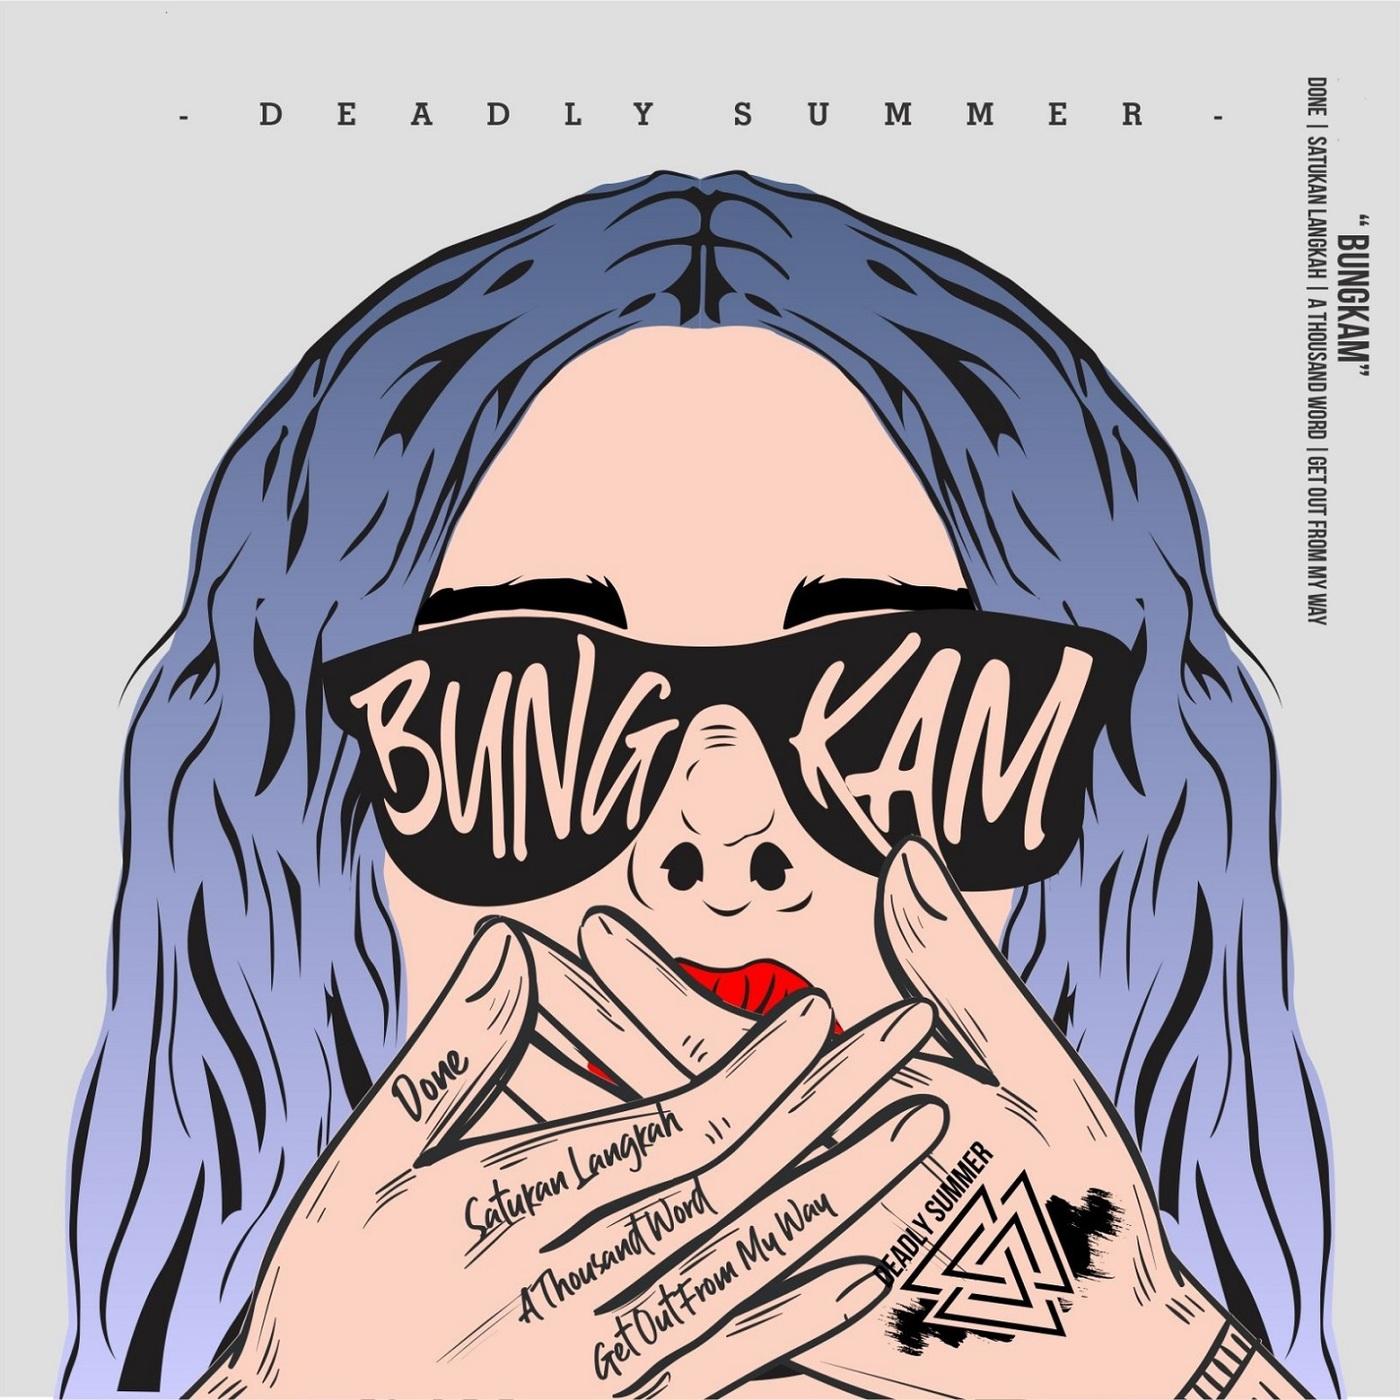 Deadly Summer - Bungkam [EP] (2019)